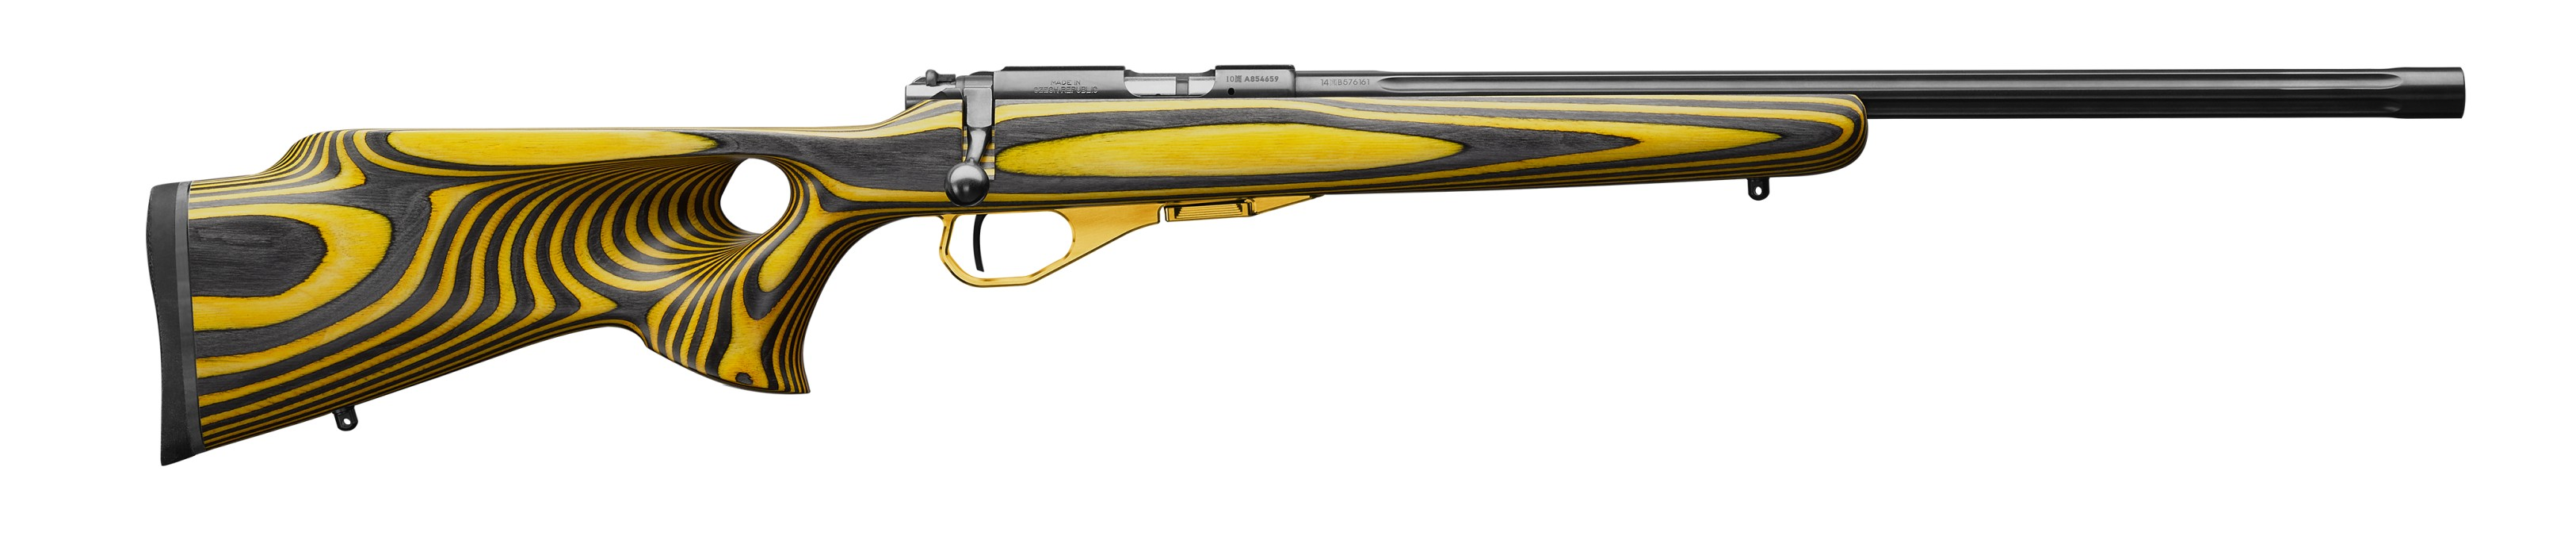 Brno CZ 455 Thumbhole Yellow